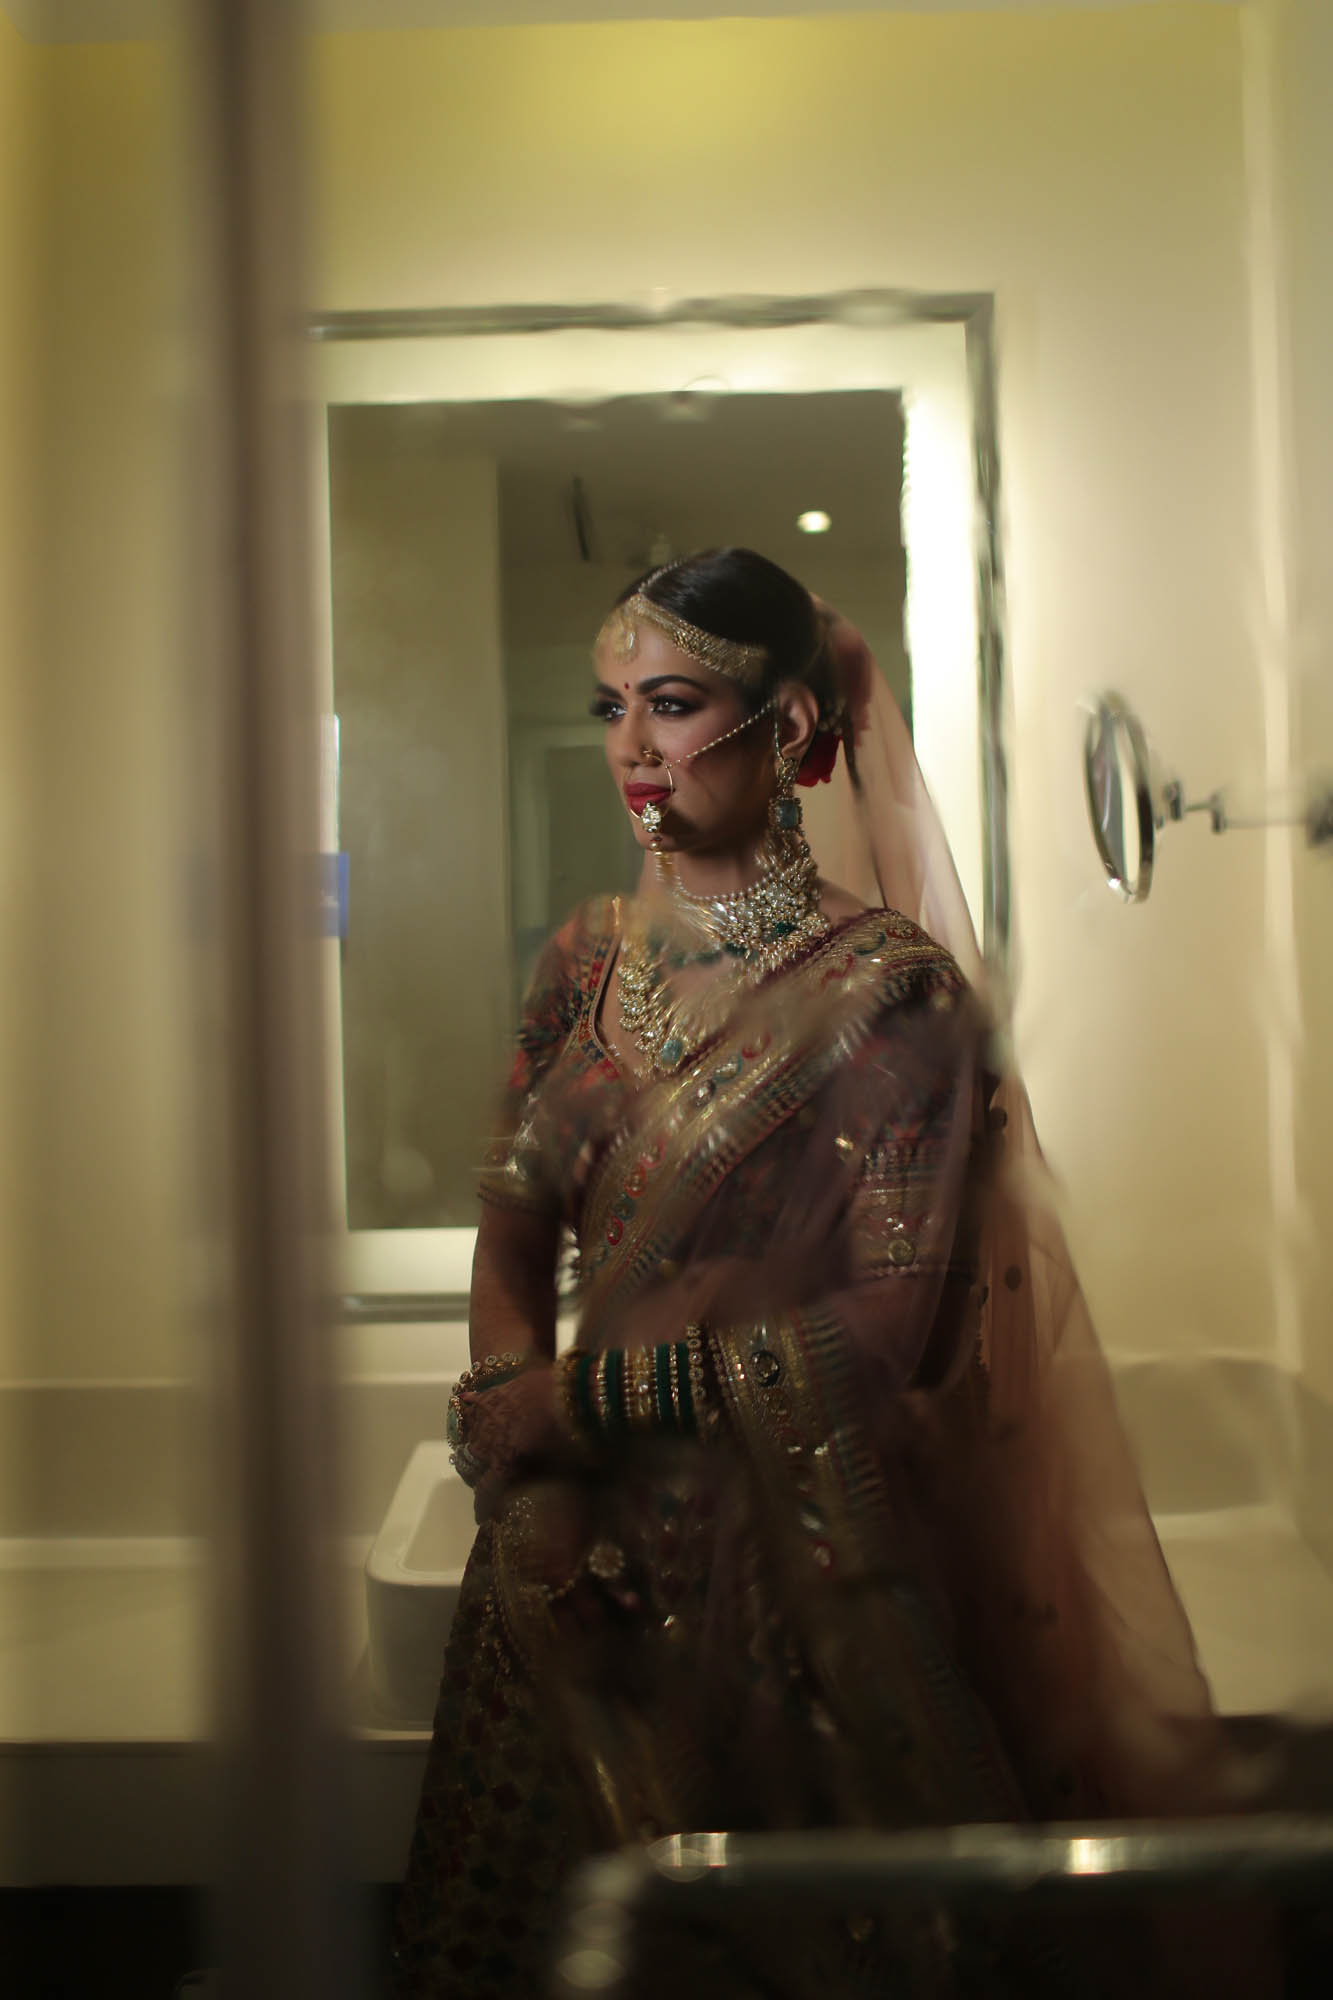 Best wedding photography in Delhi NCR